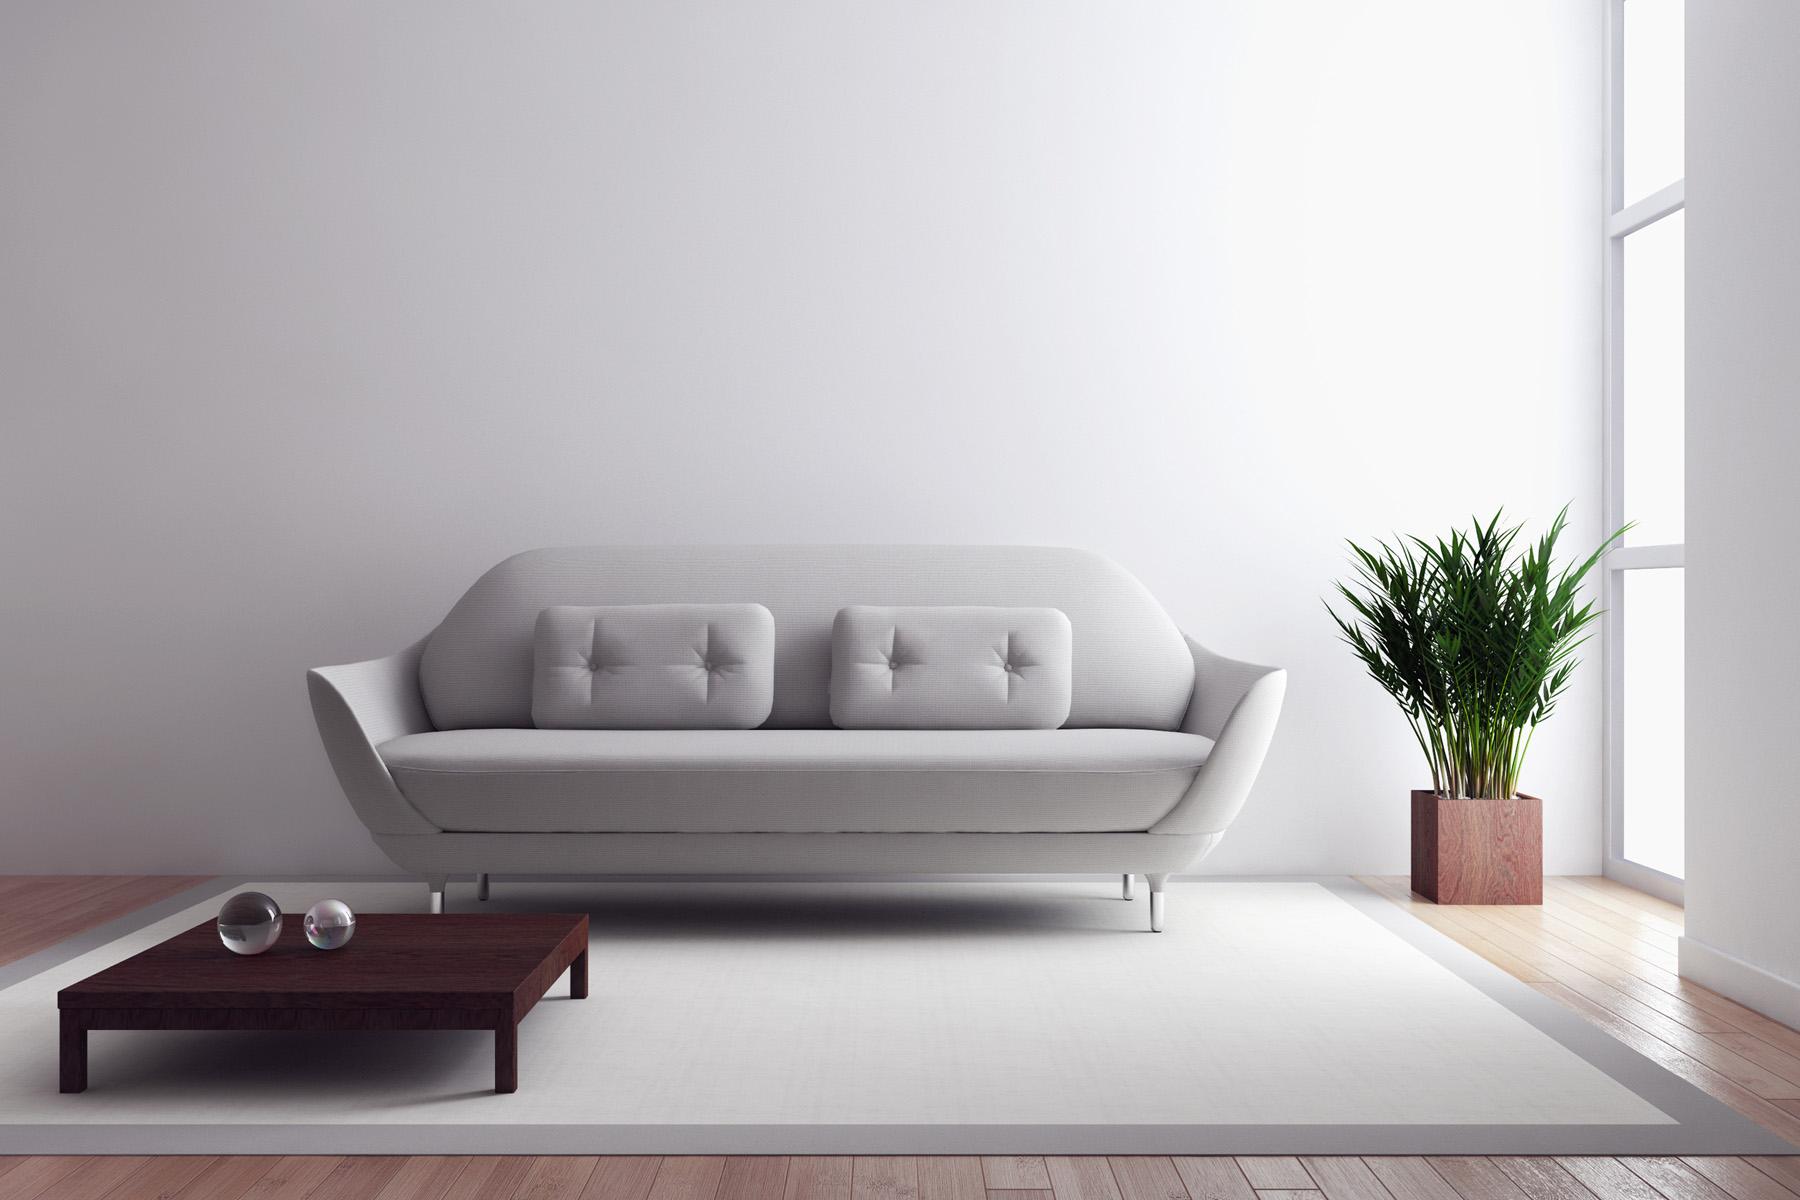 sofa room room sofa NWKOHRI